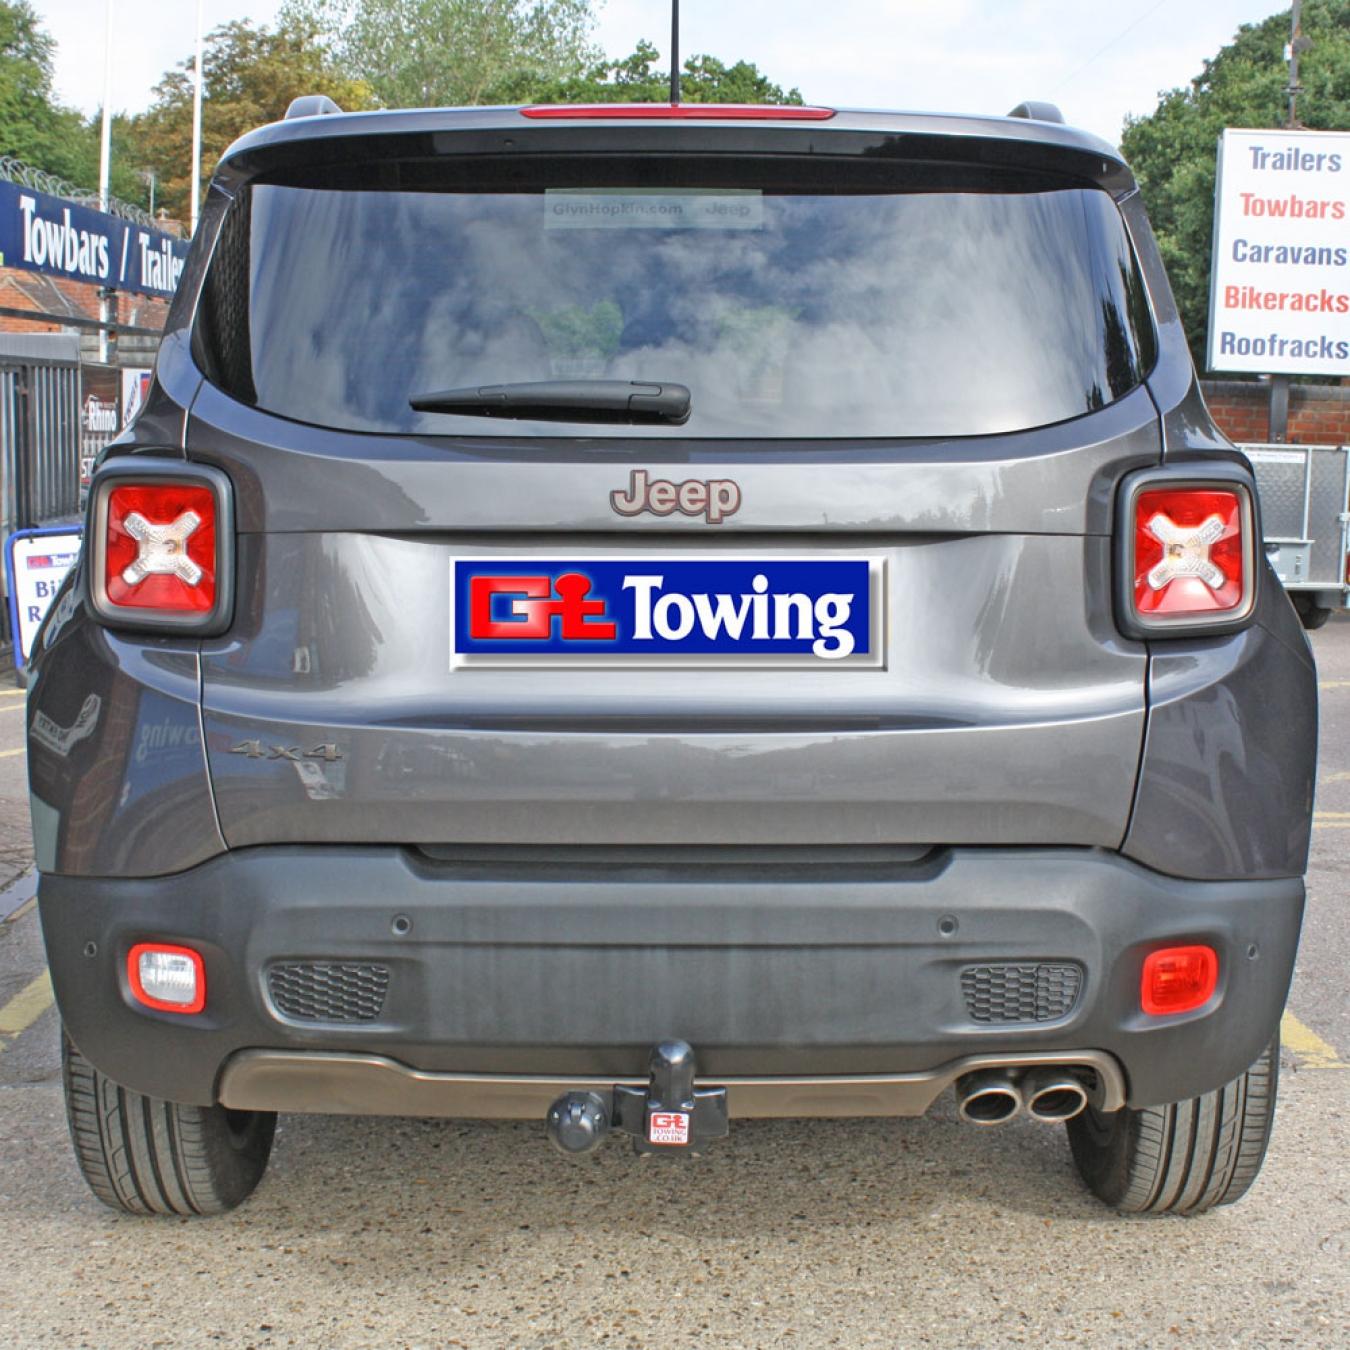 Jeep Renegade Towbars